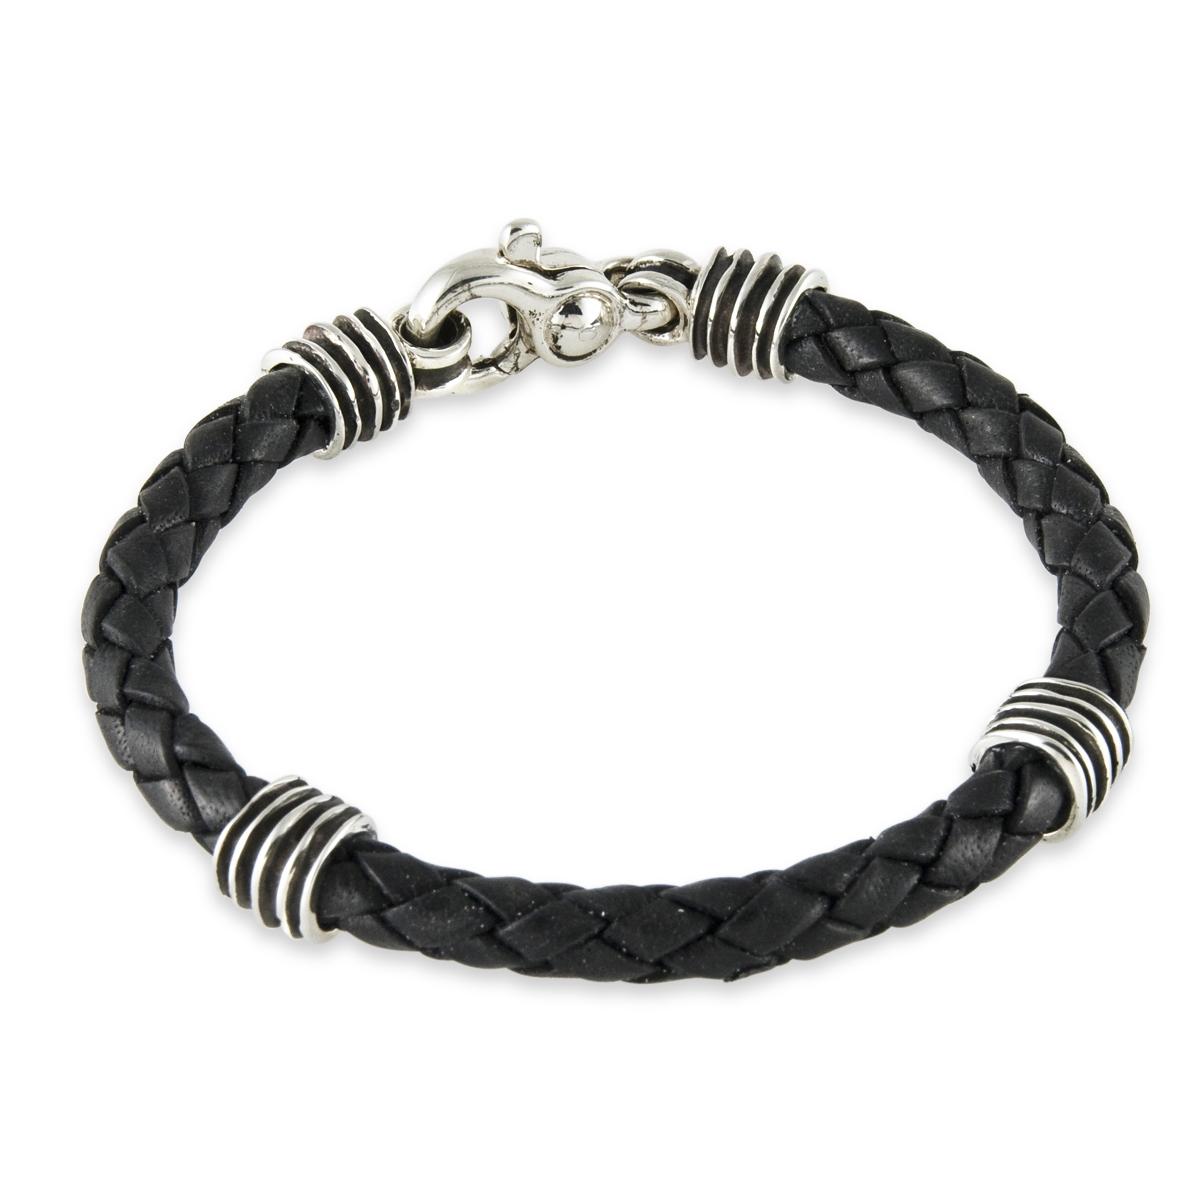 Silver and Black Leather Bracelet - A1320-8.5-L